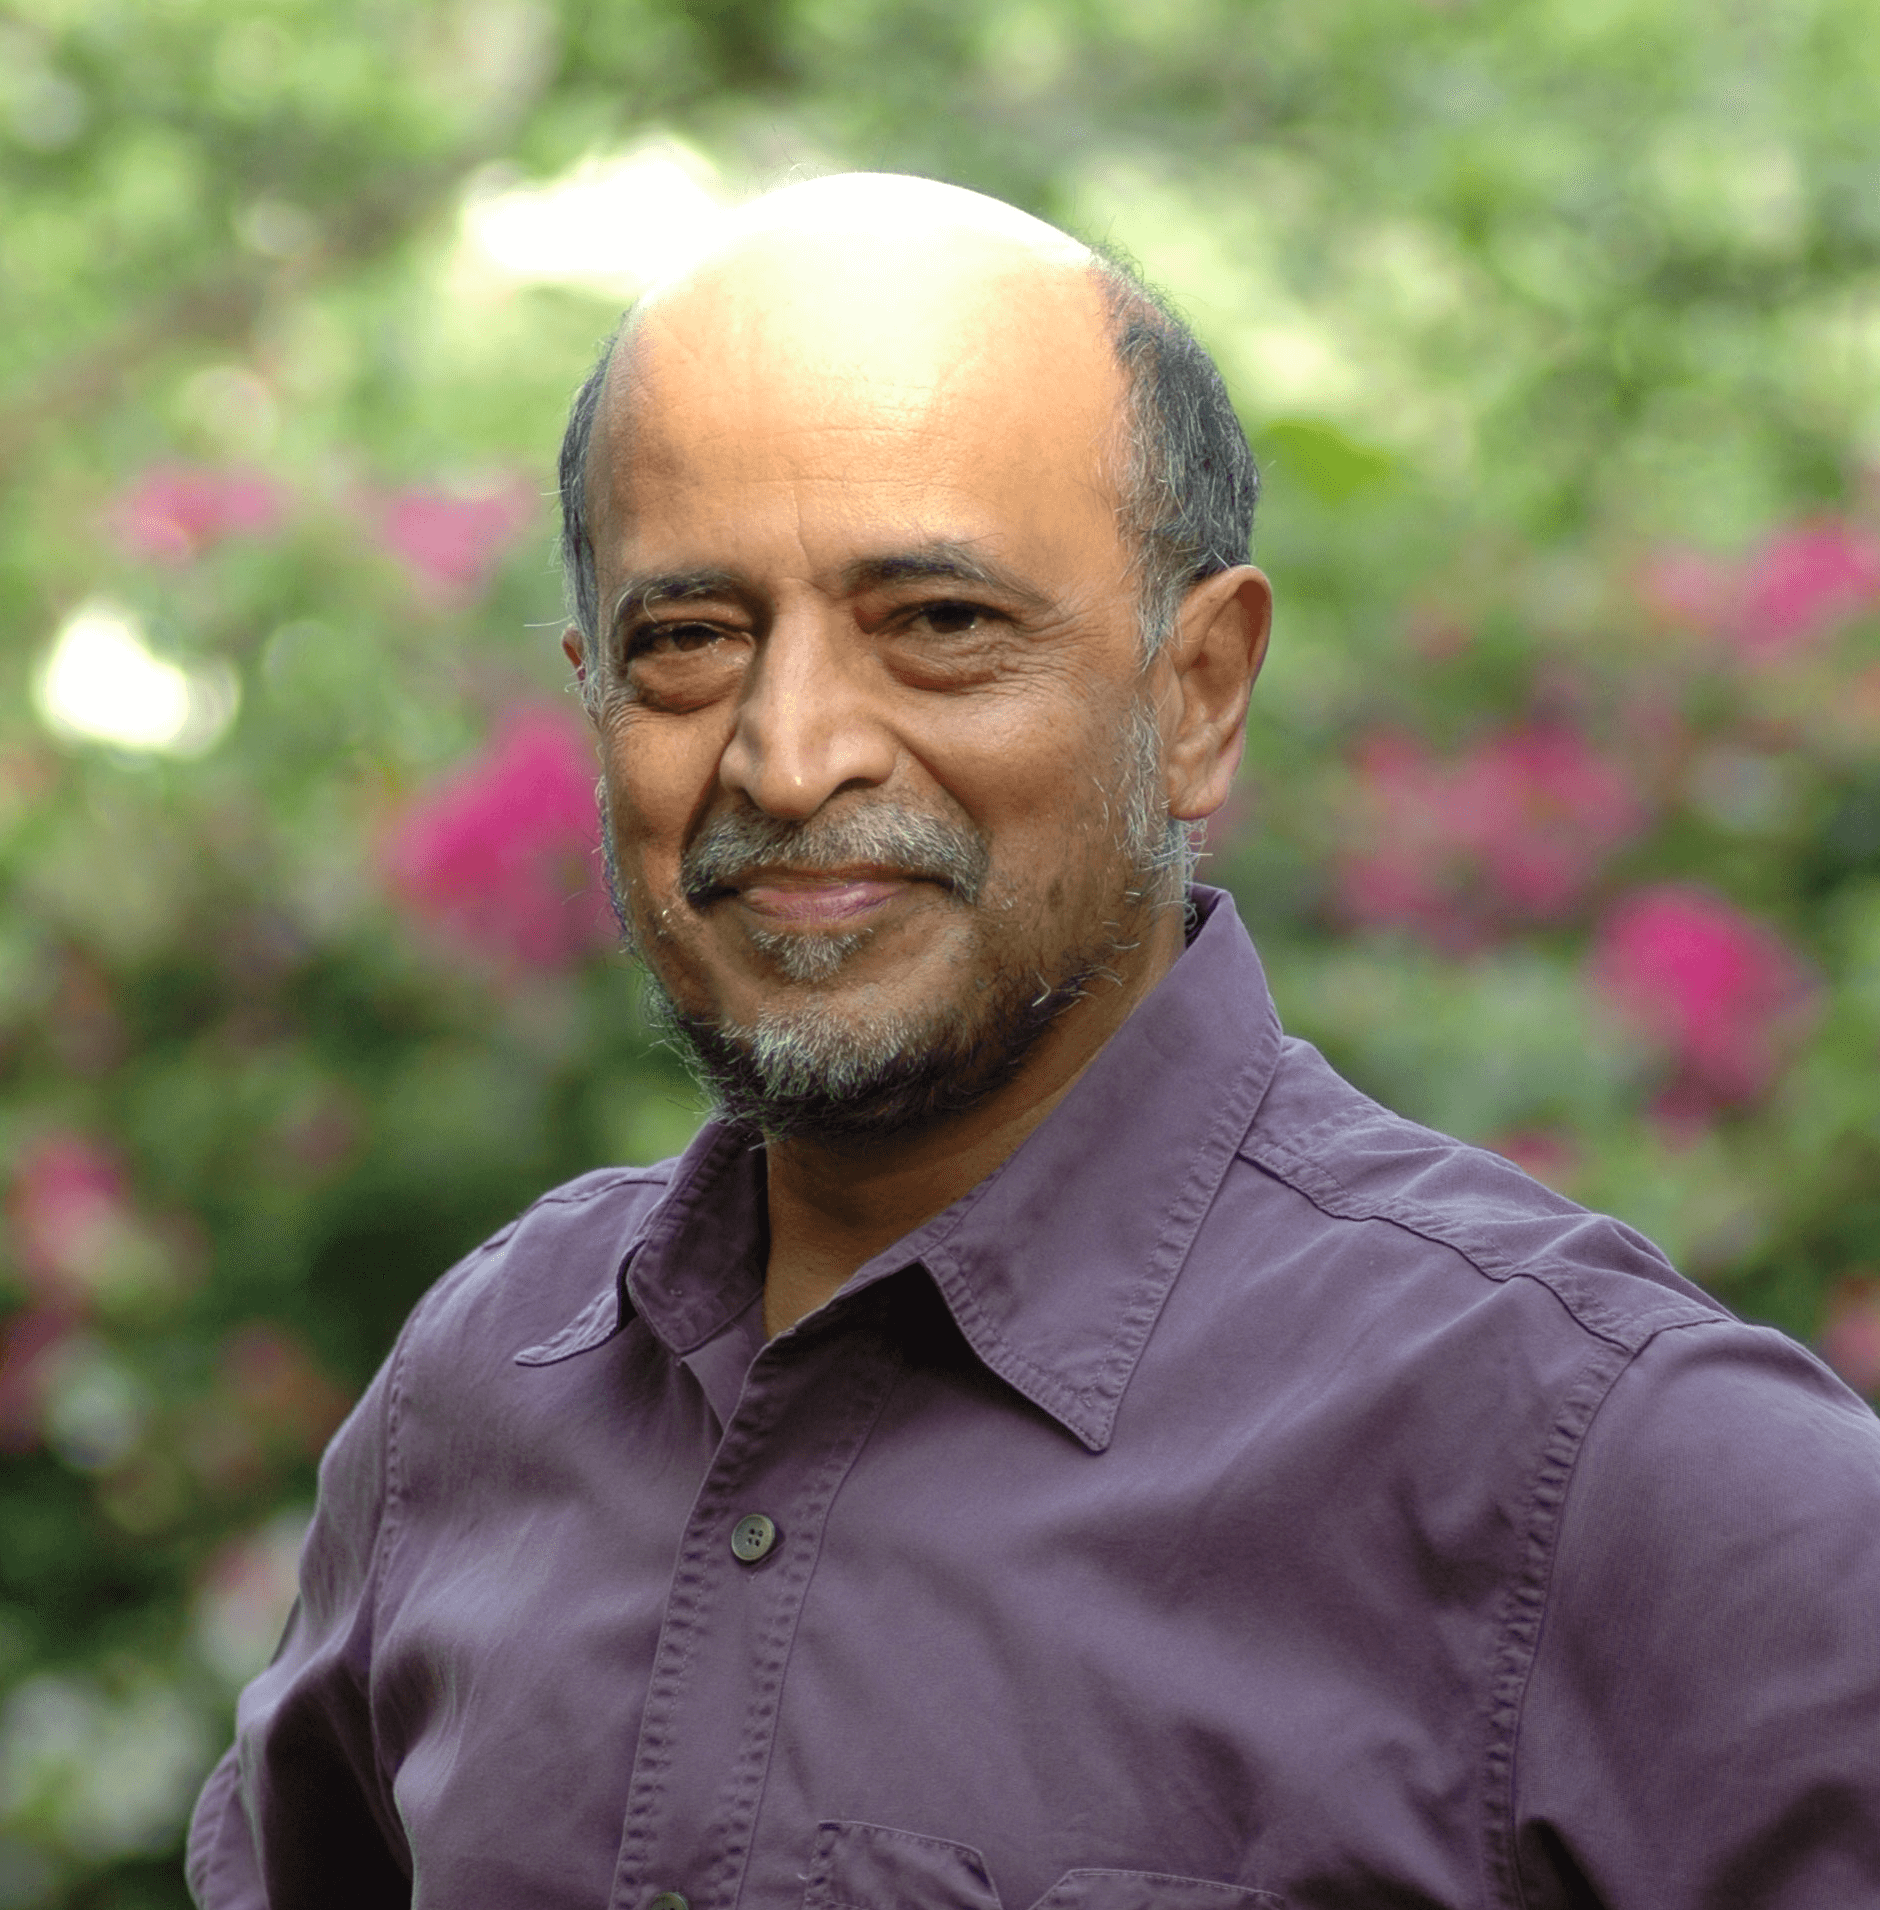 Darryl D'Monte